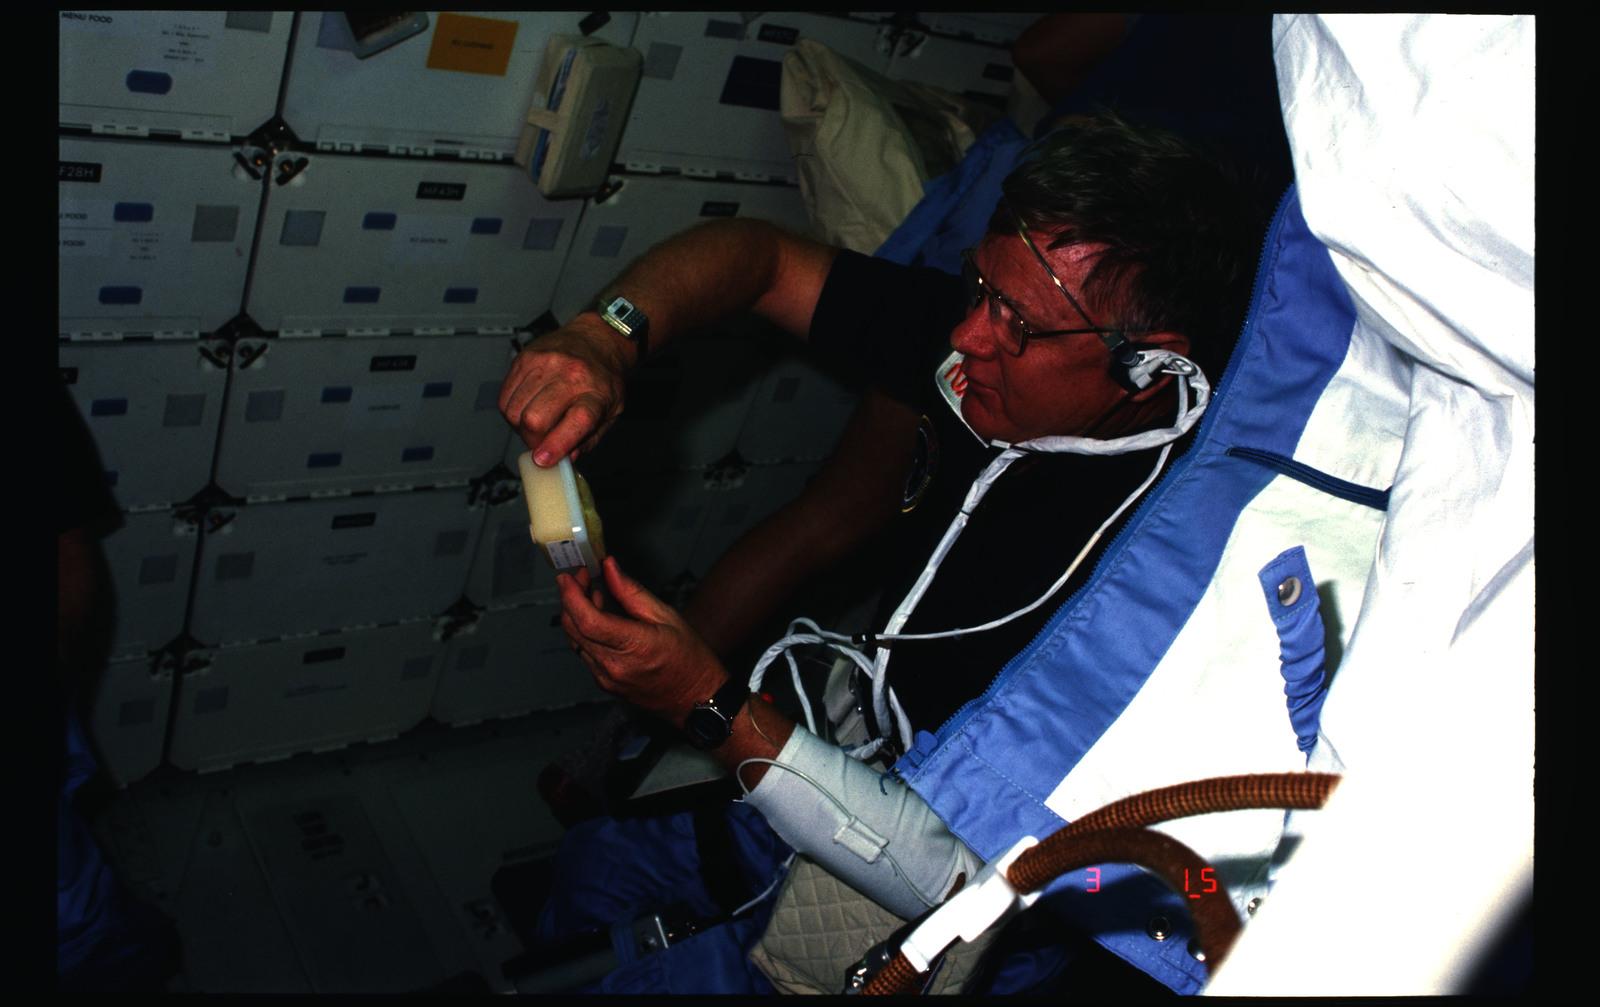 51B-12-018 - STS-51B - 51B crew activities